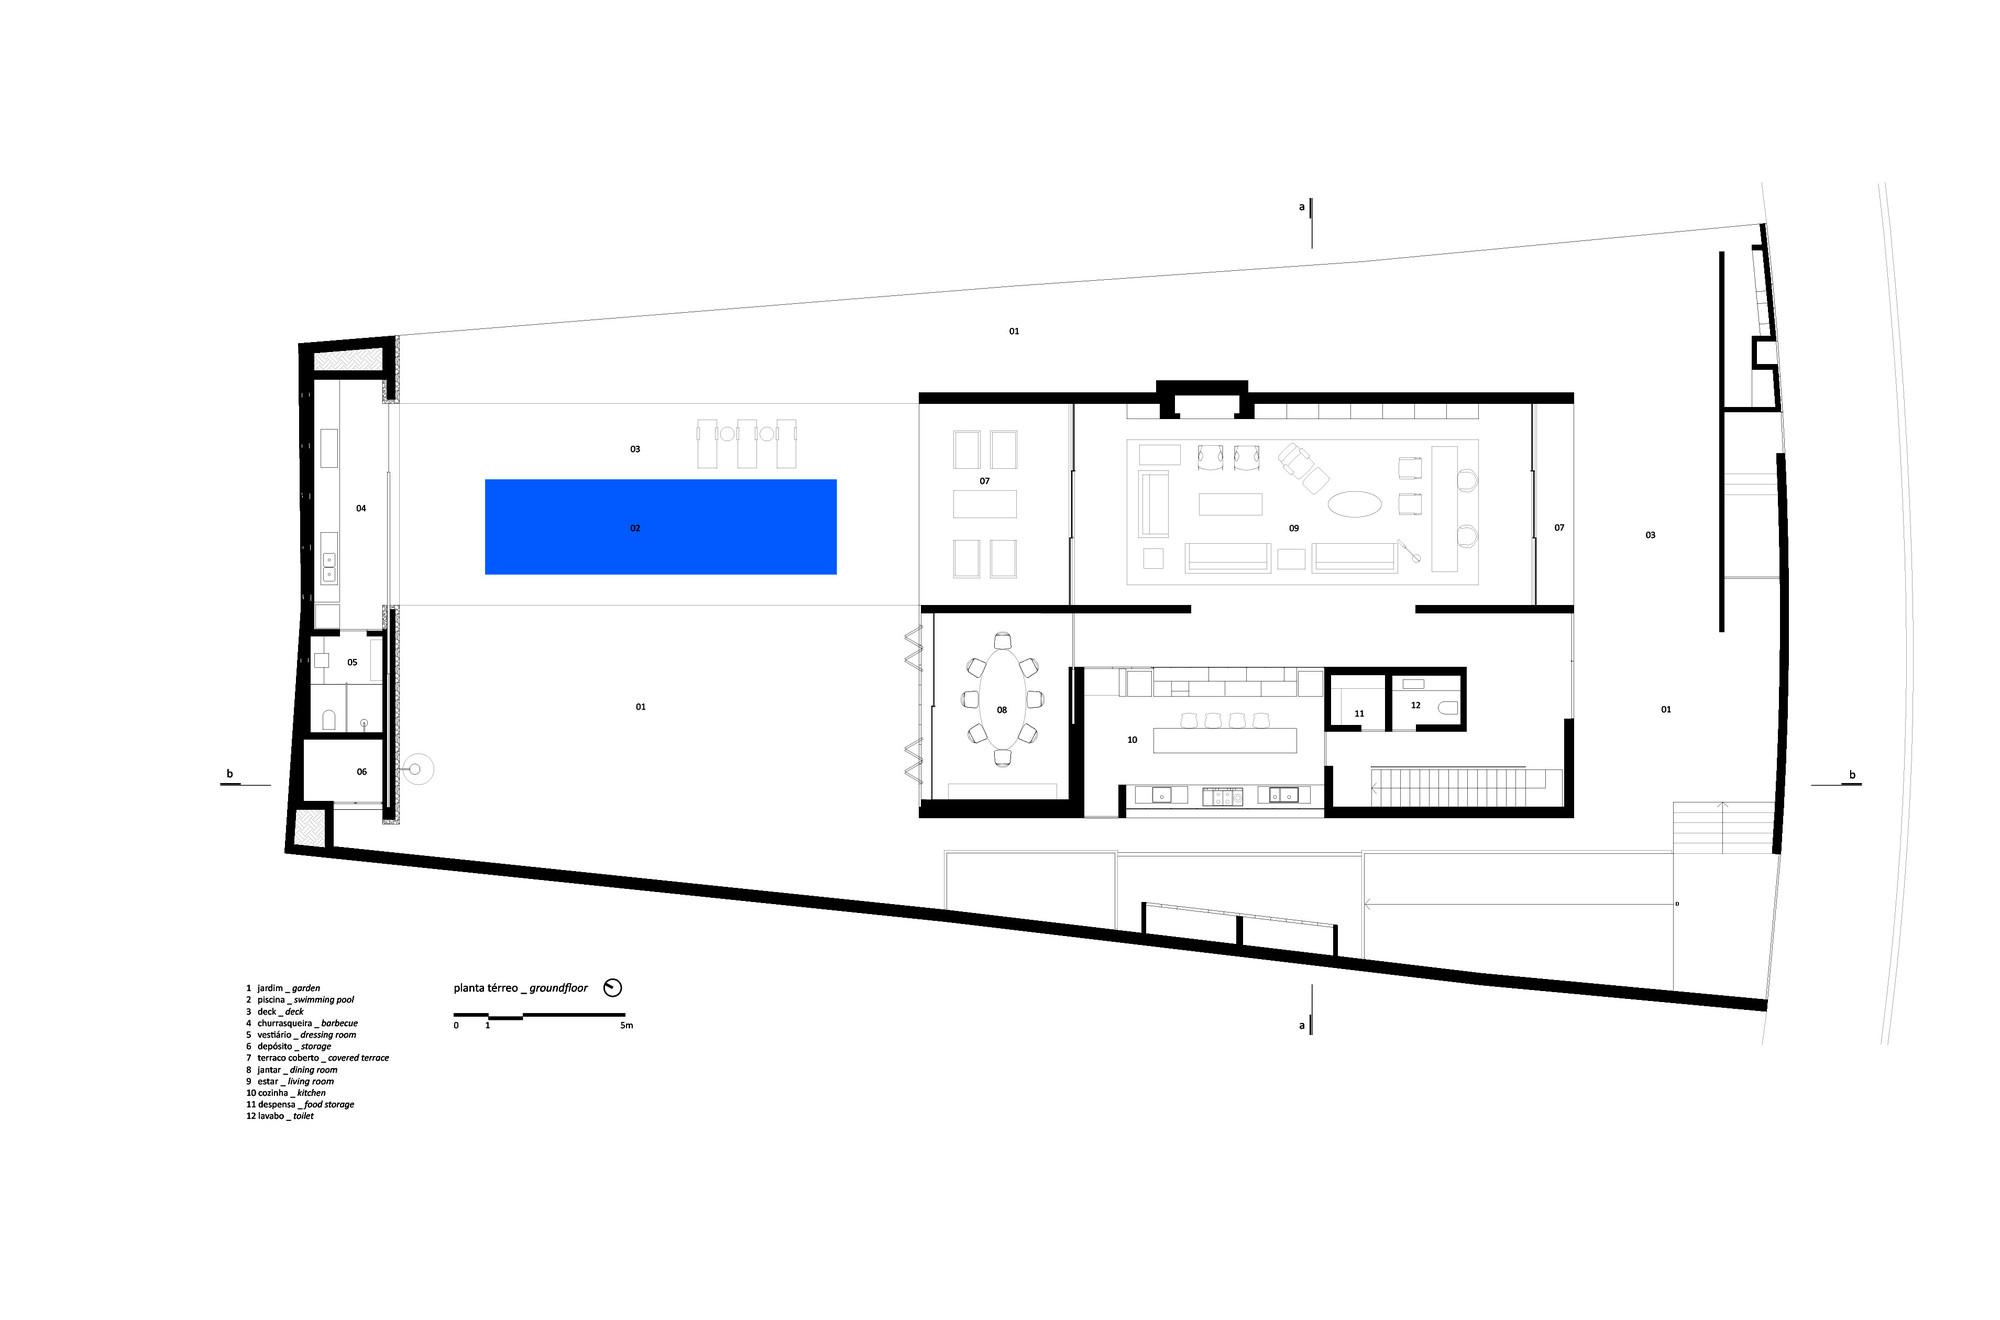 54603f6ce58ece1e47000129 Floor Plan on Floor Plans